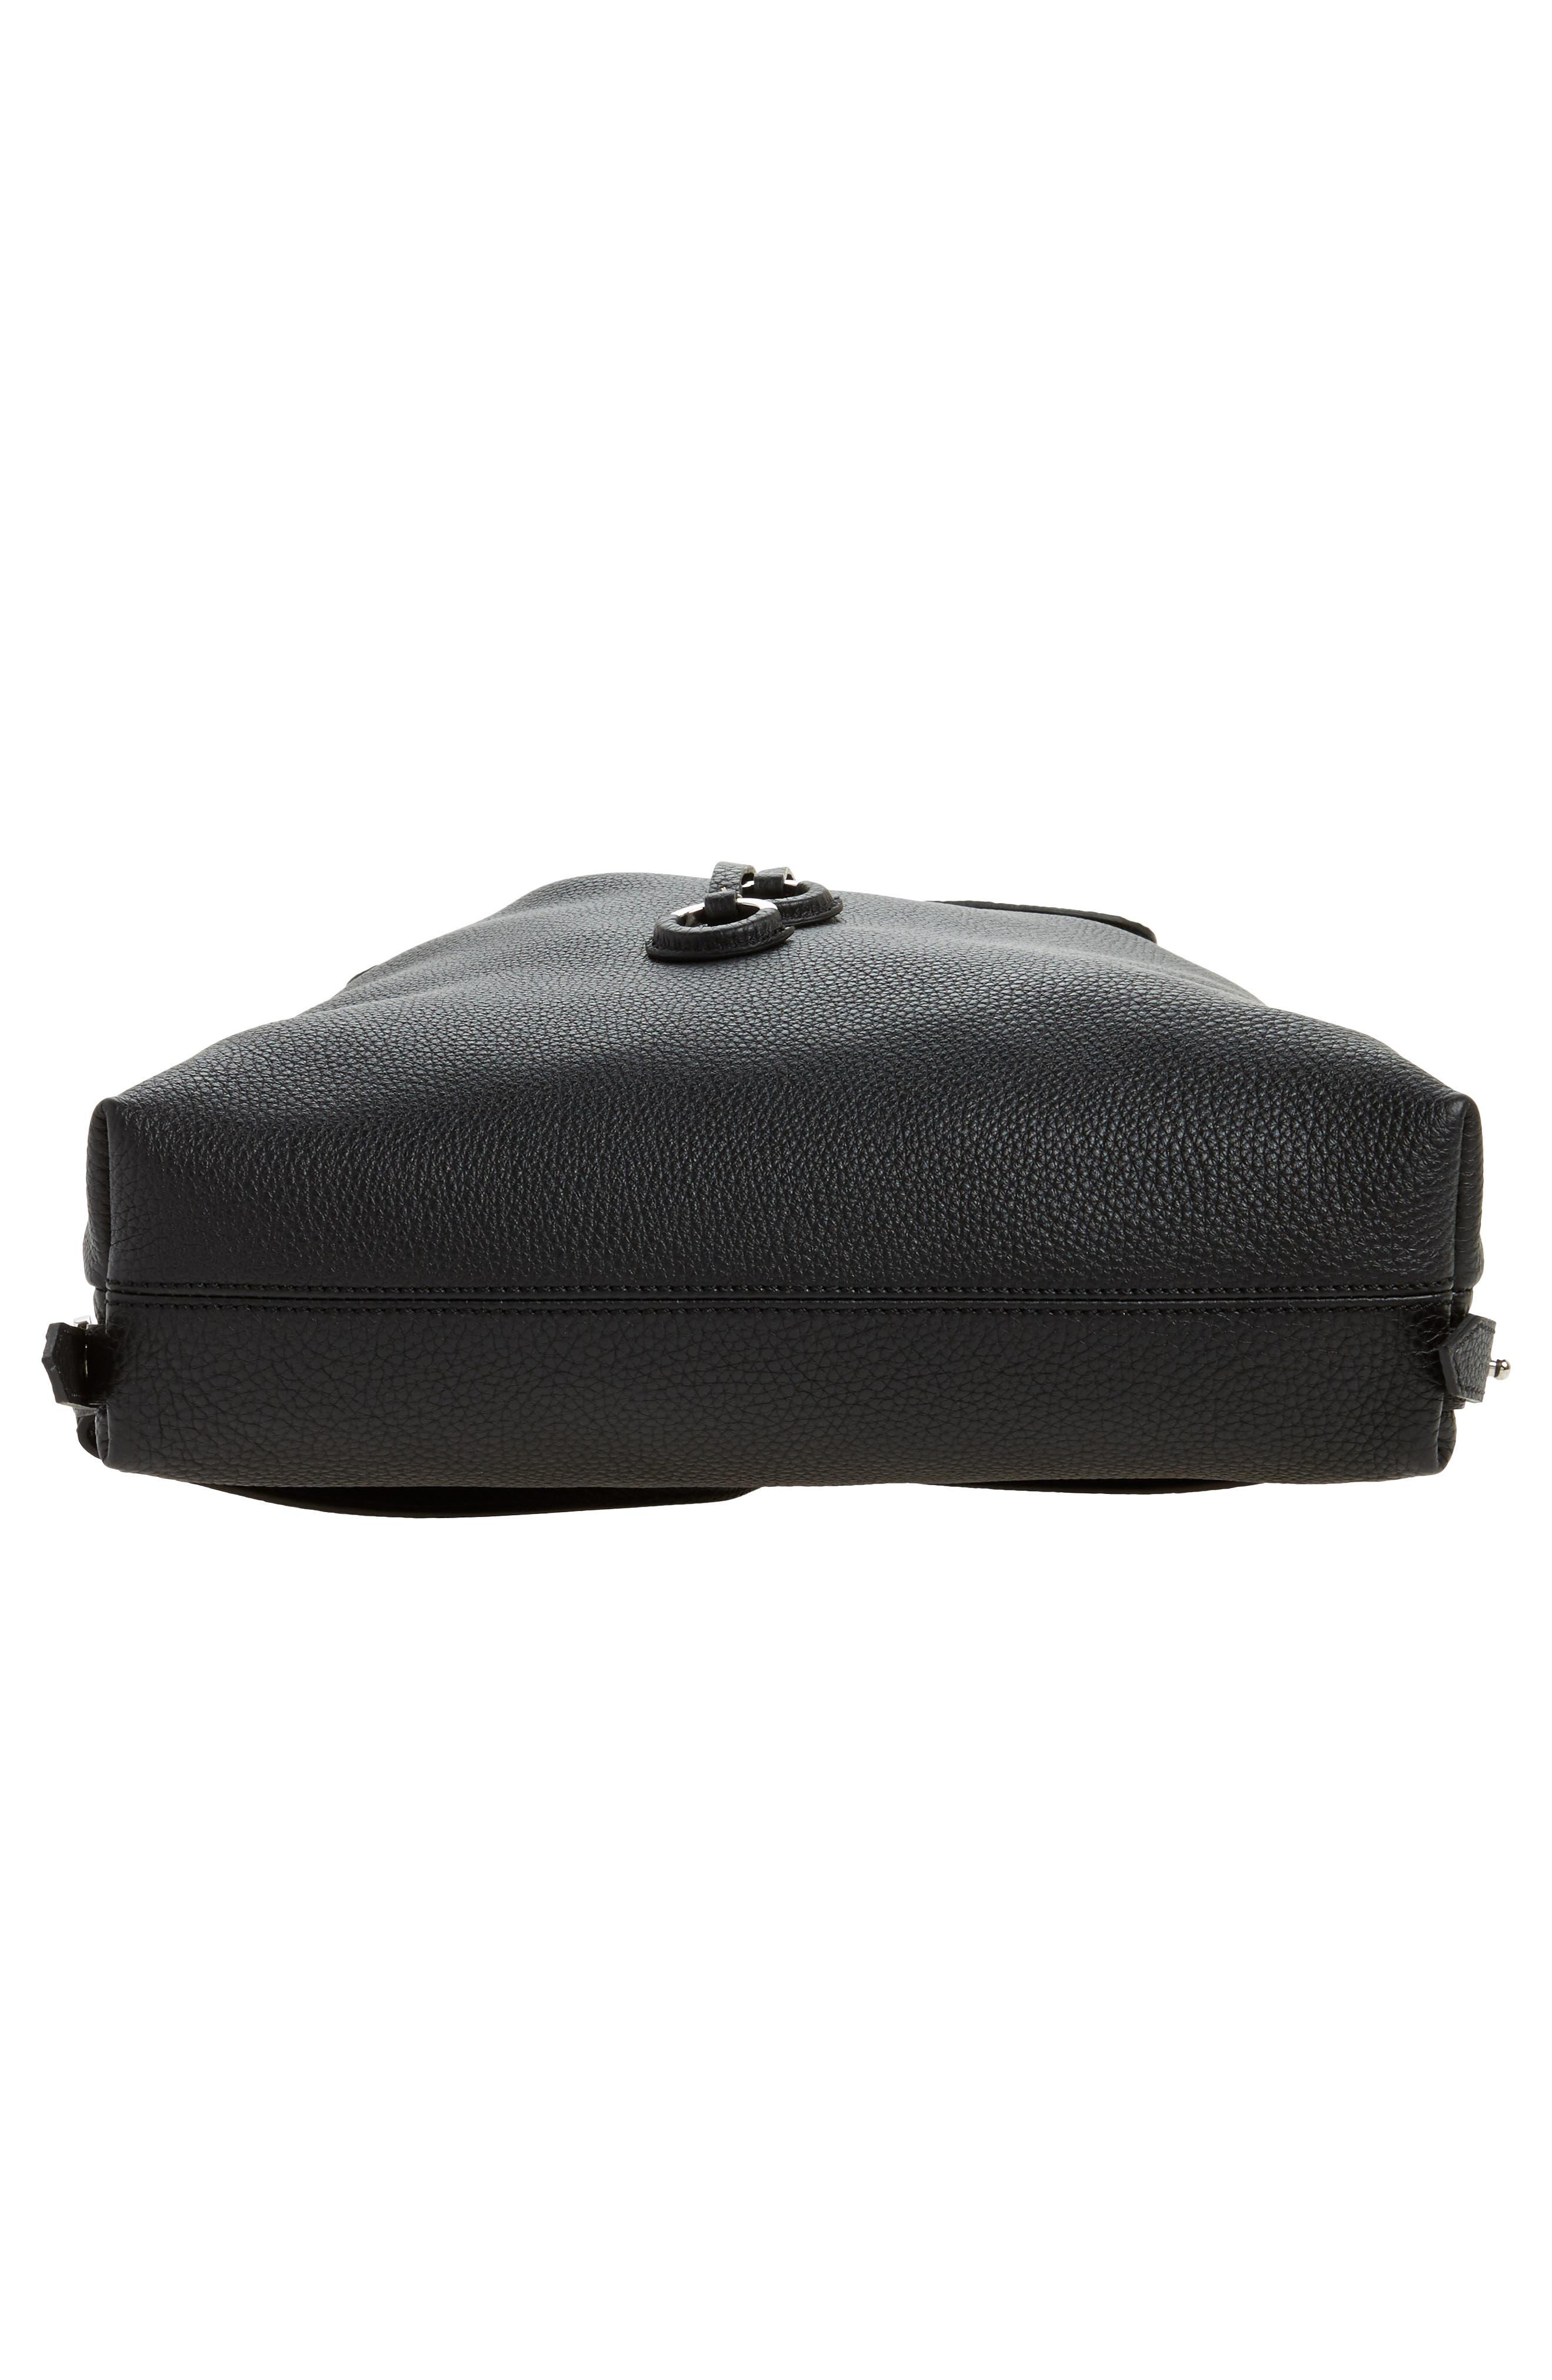 Carmen Cachemire Leather Backpack,                             Alternate thumbnail 6, color,                             Black